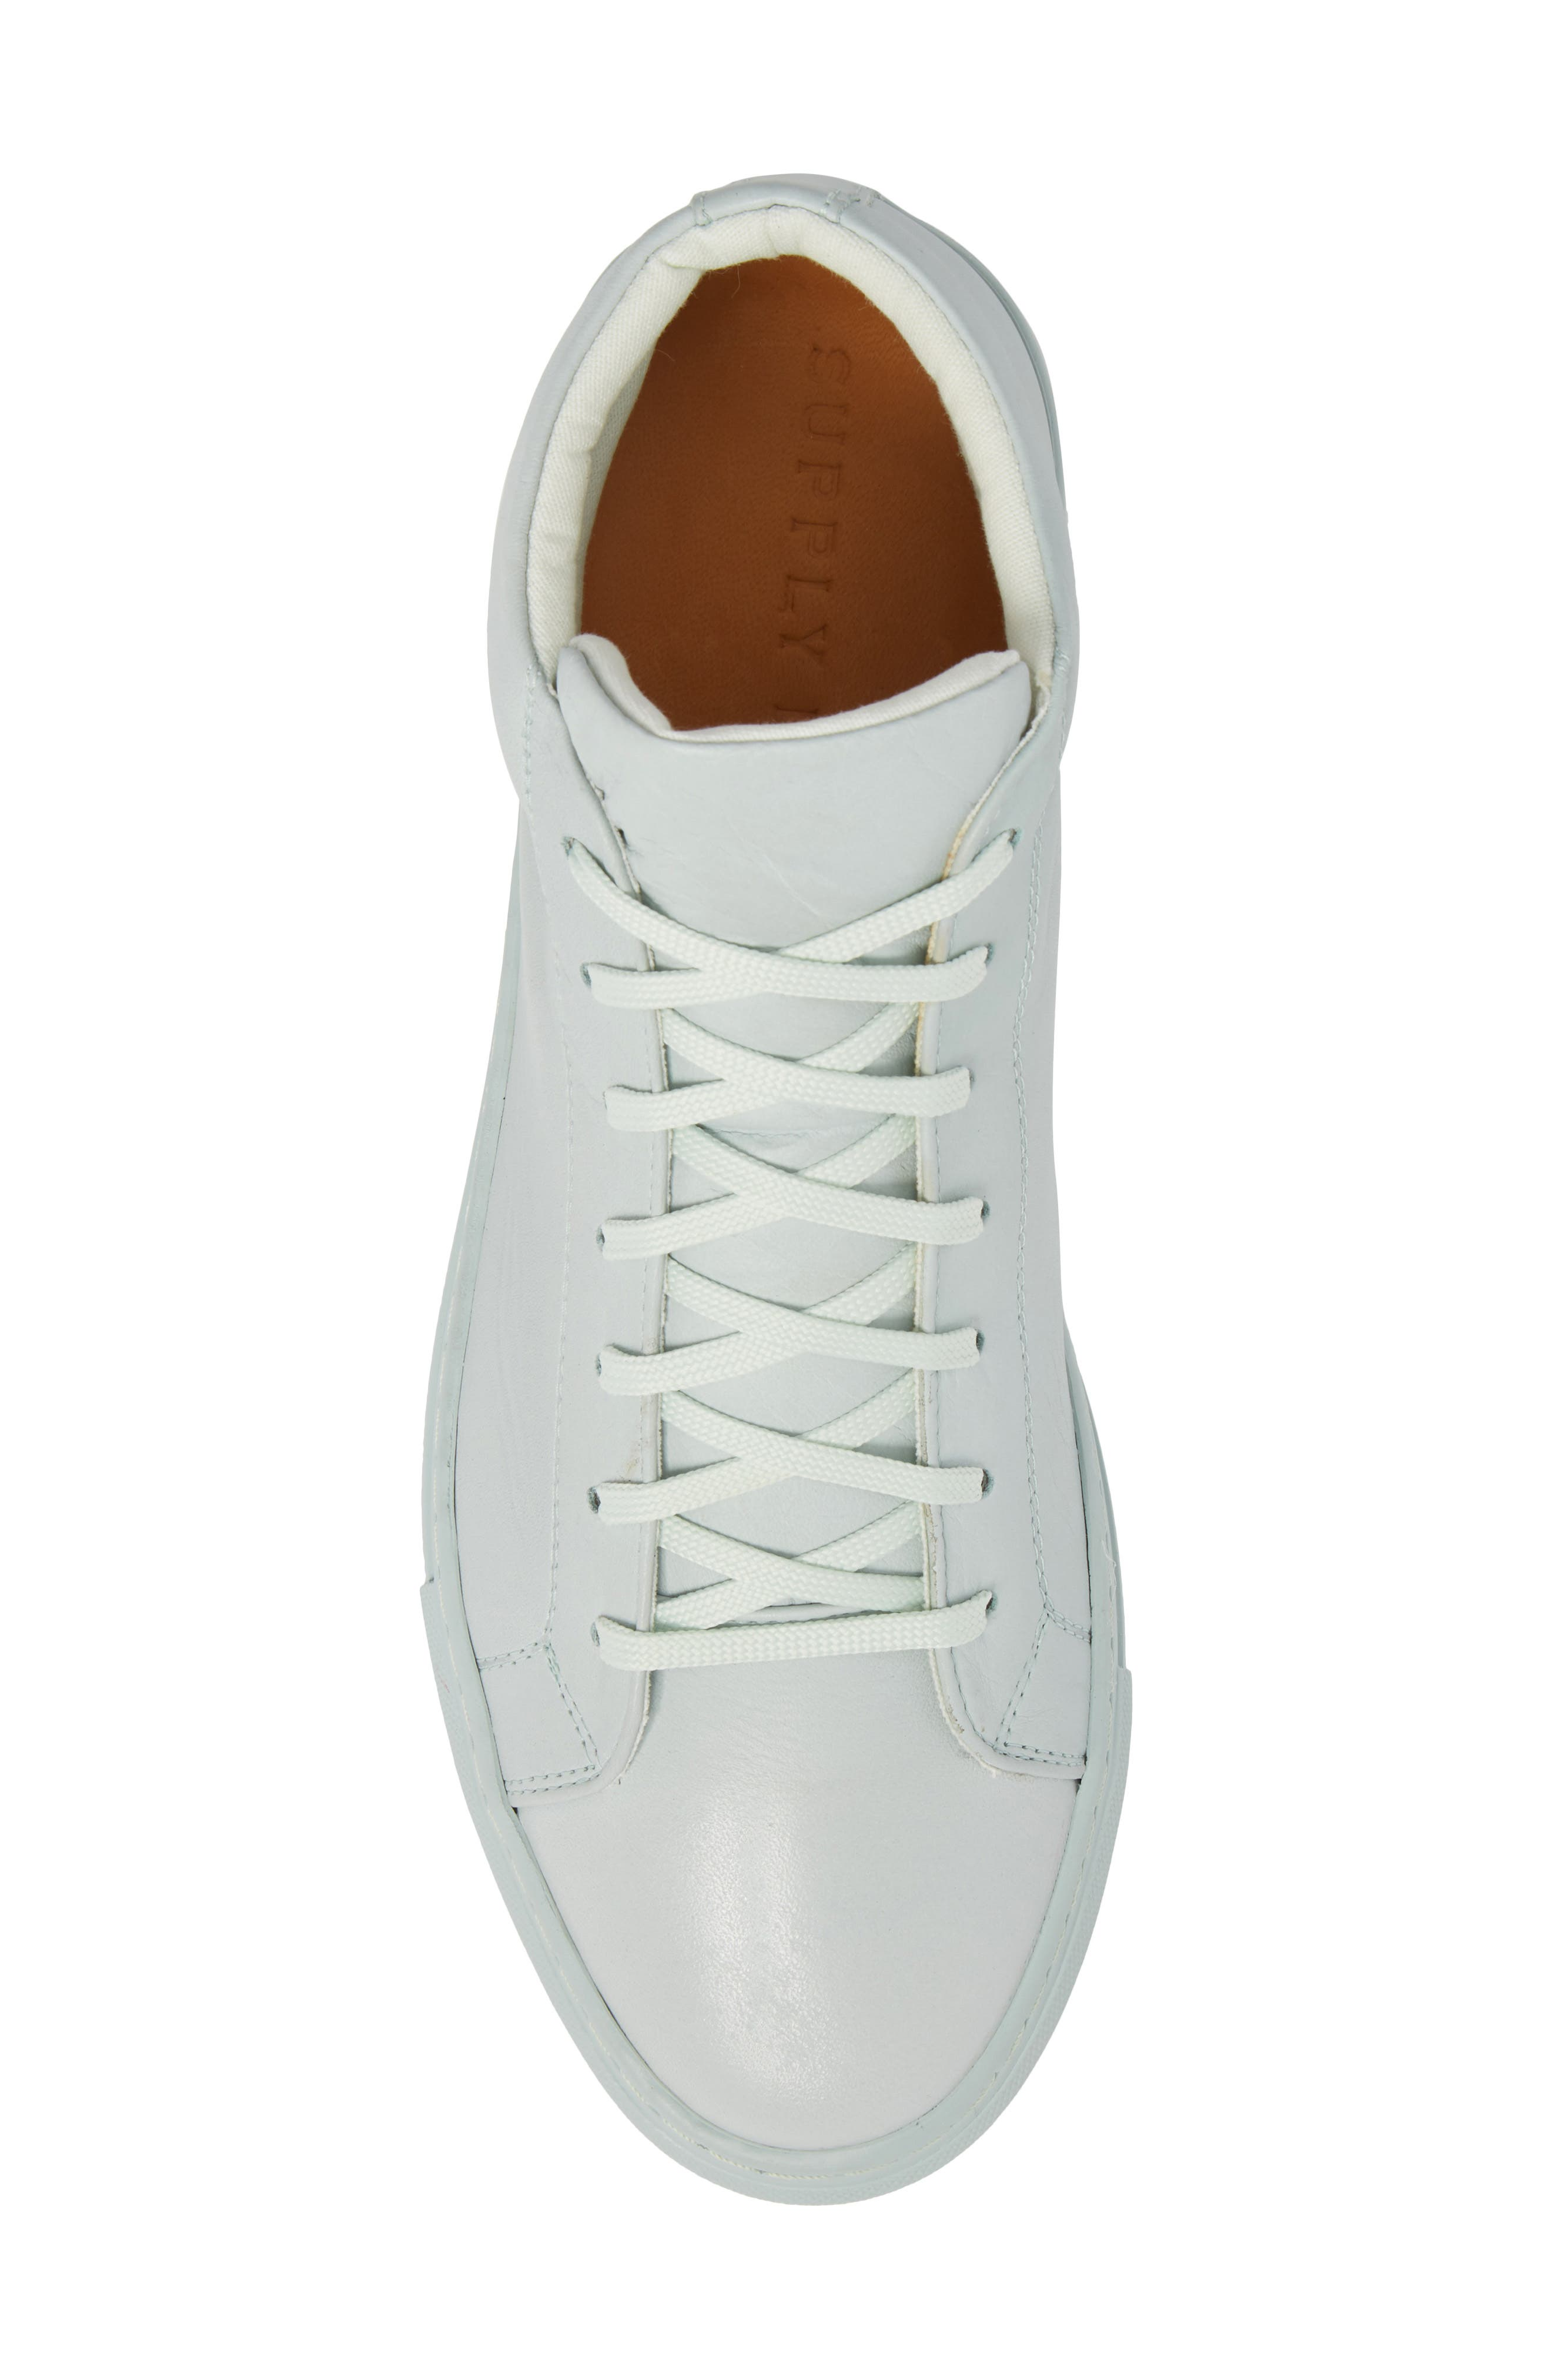 Lexington Mid Top Sneaker,                             Alternate thumbnail 5, color,                             303